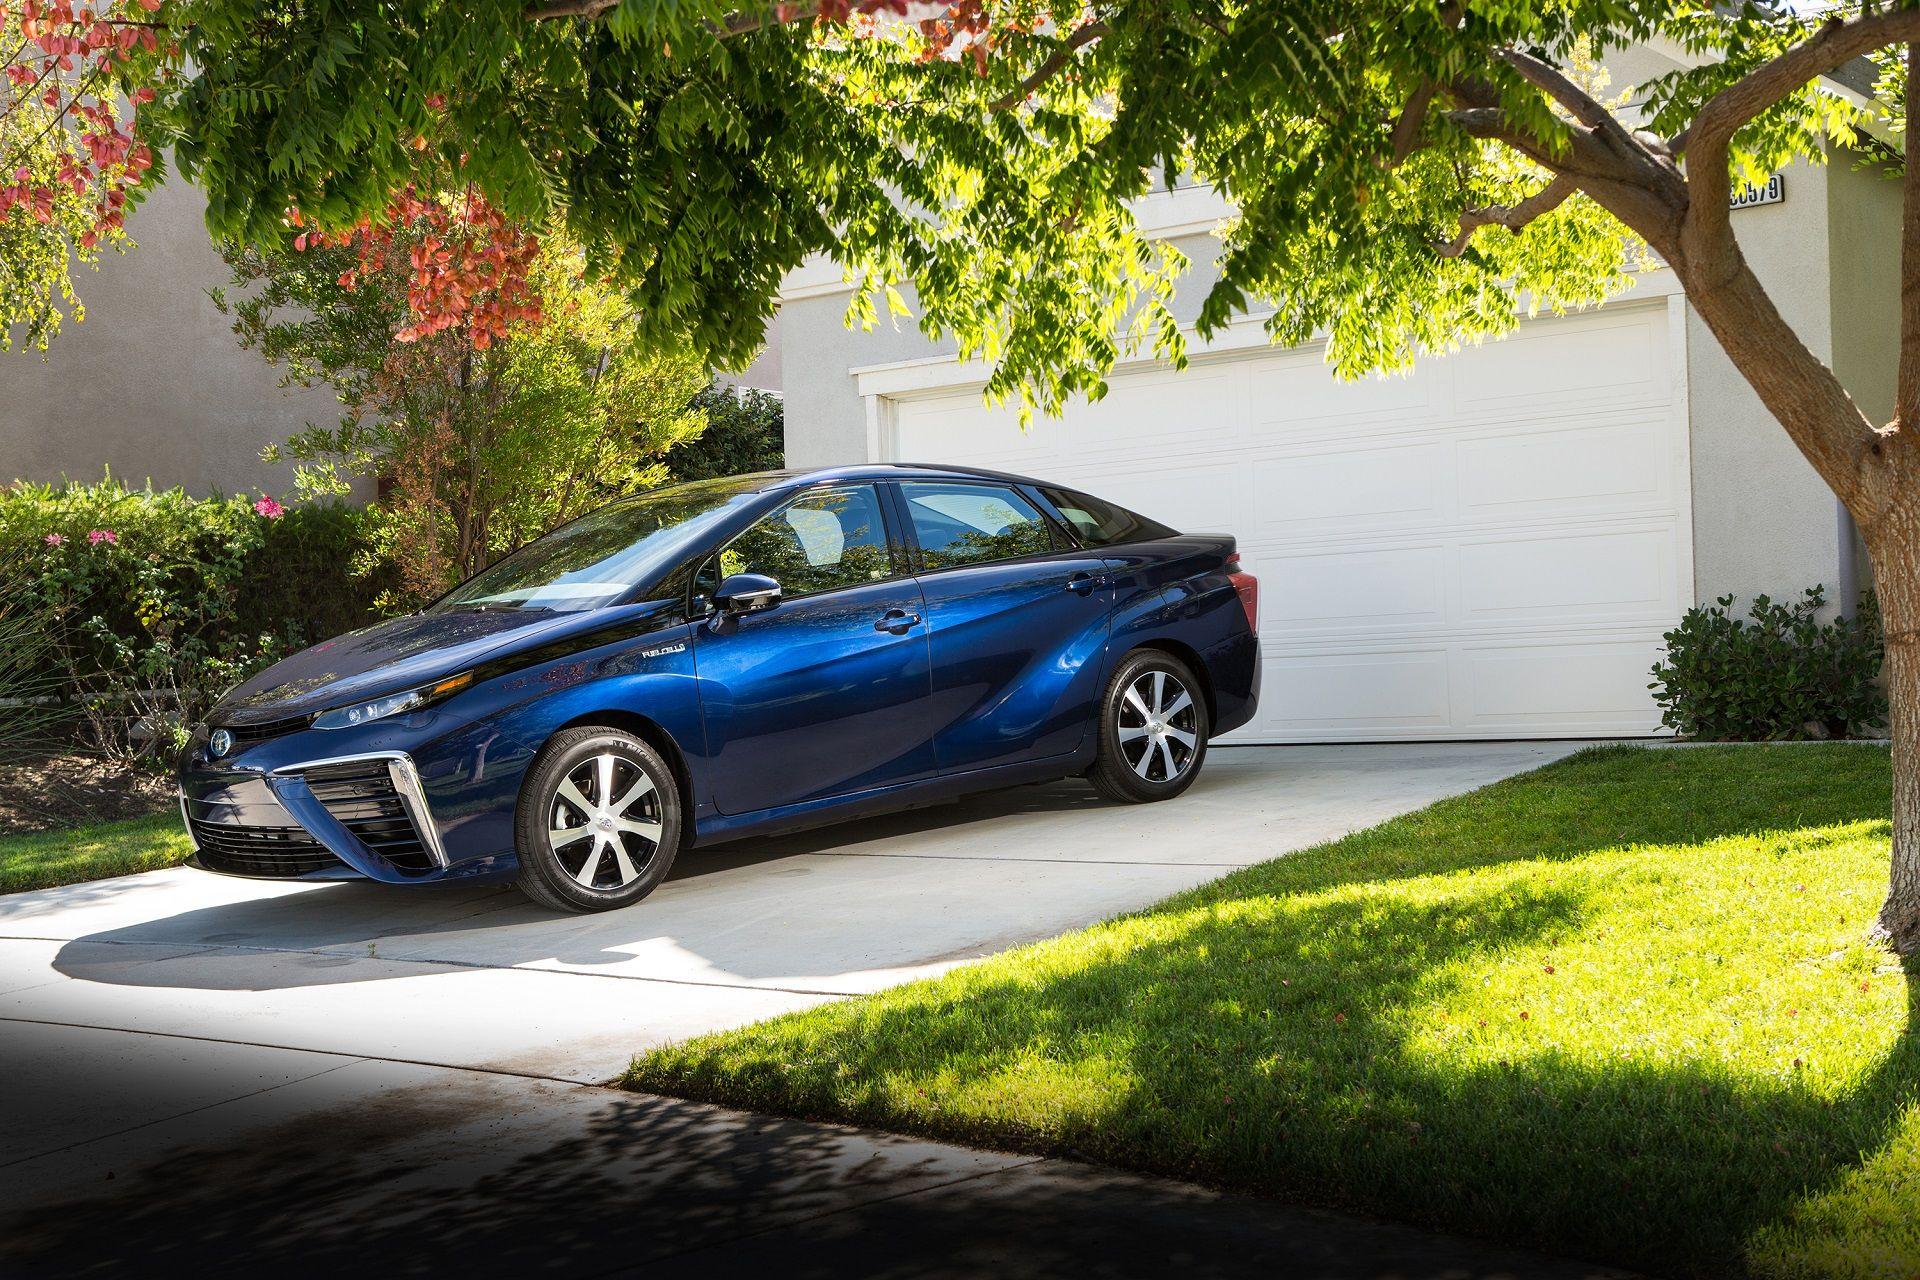 2017 Toyota Mirai Hydrogen car, Hydrogen powered cars